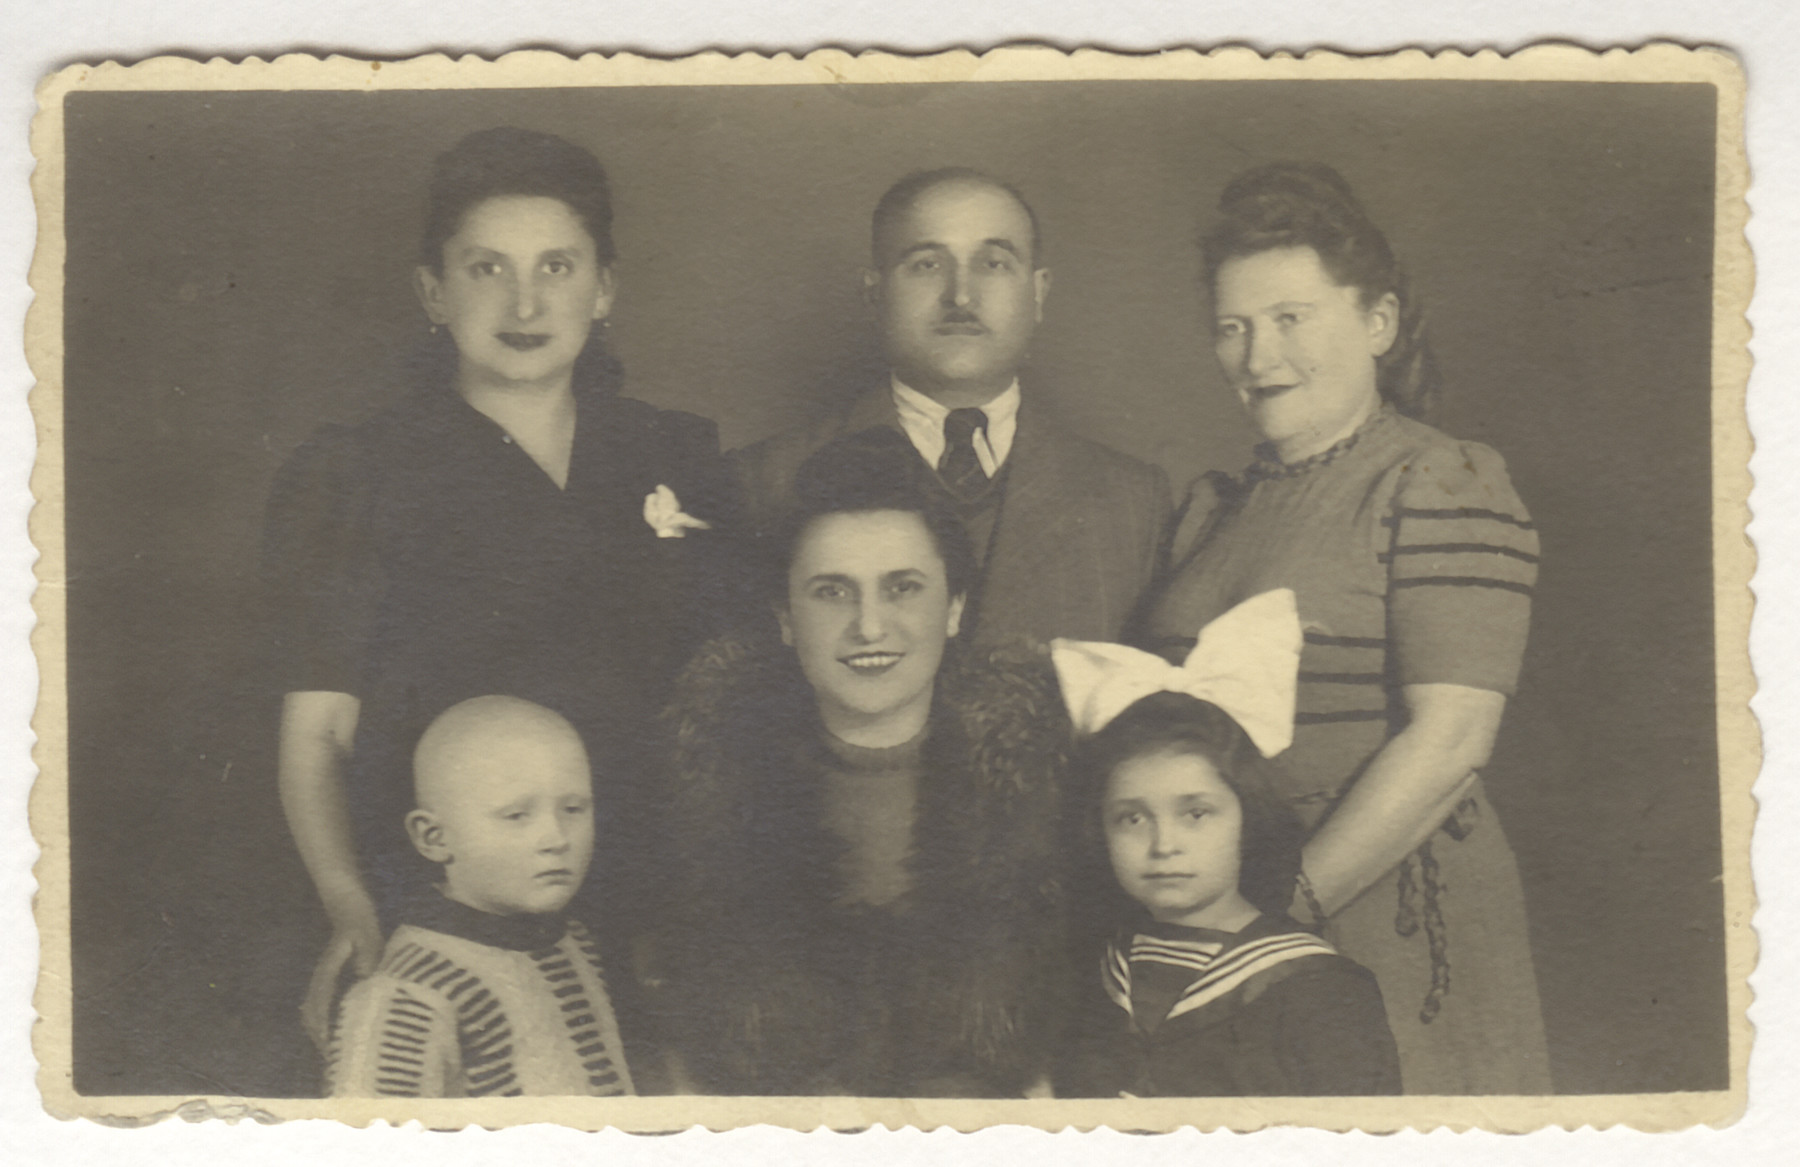 Studio portrait of surviivng members of the Jonisch family.  Top row: Cecia Jonisch, Sam Jonisch, Sophie Jonisch Bornstein.  Bottom row: Michael Bornstein, Hilda Jonisch and Ruth Jonisch.